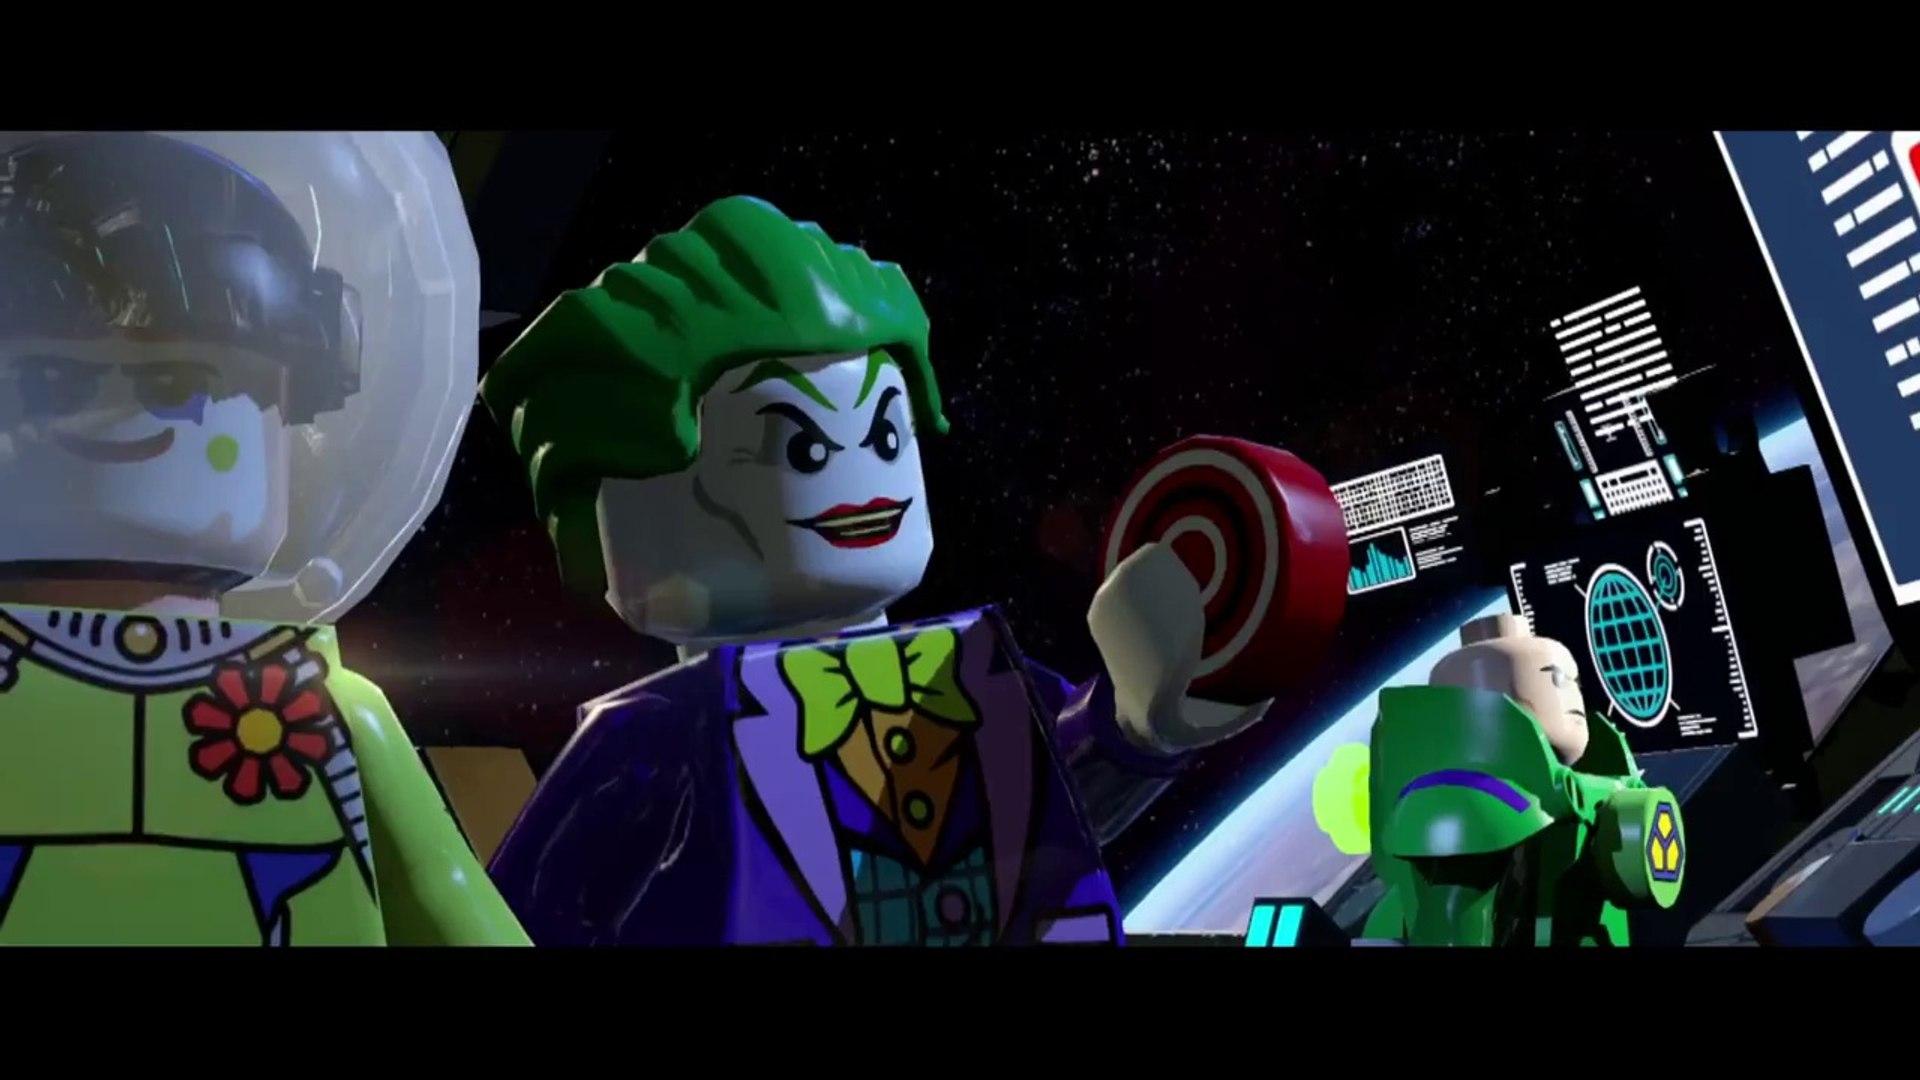 LEGO Batman 3: Beyond Gotham - Behind the Scenes and Gameplay